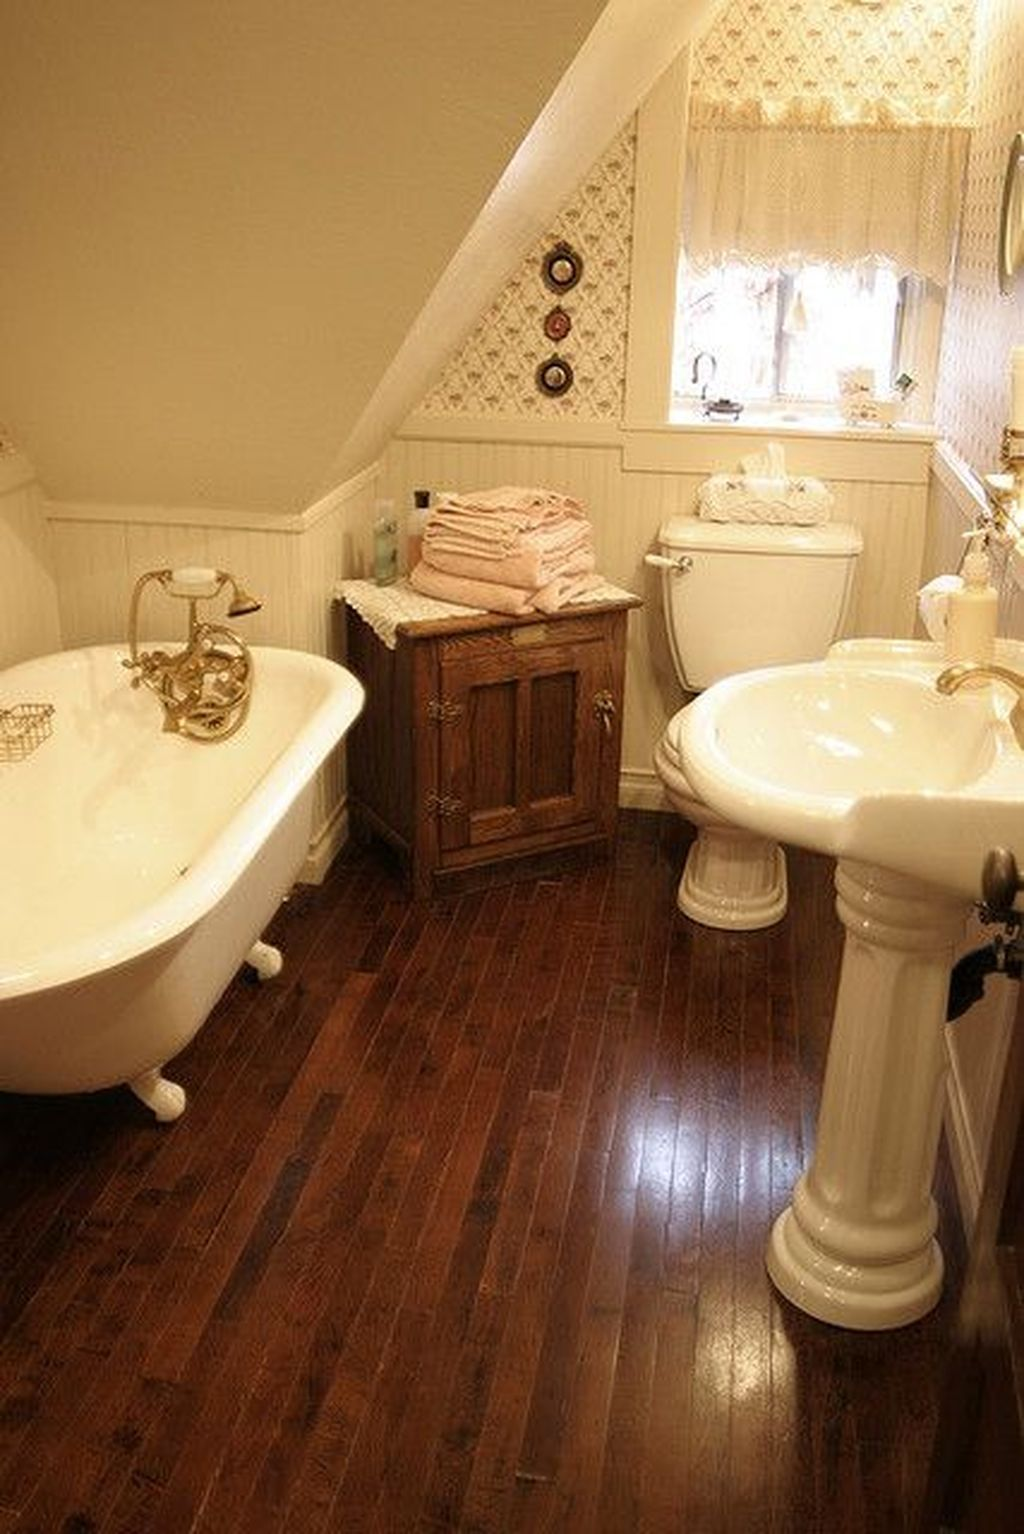 Vintage badezimmer design  modern small bathroom with clawfoot tub design  badezimmer